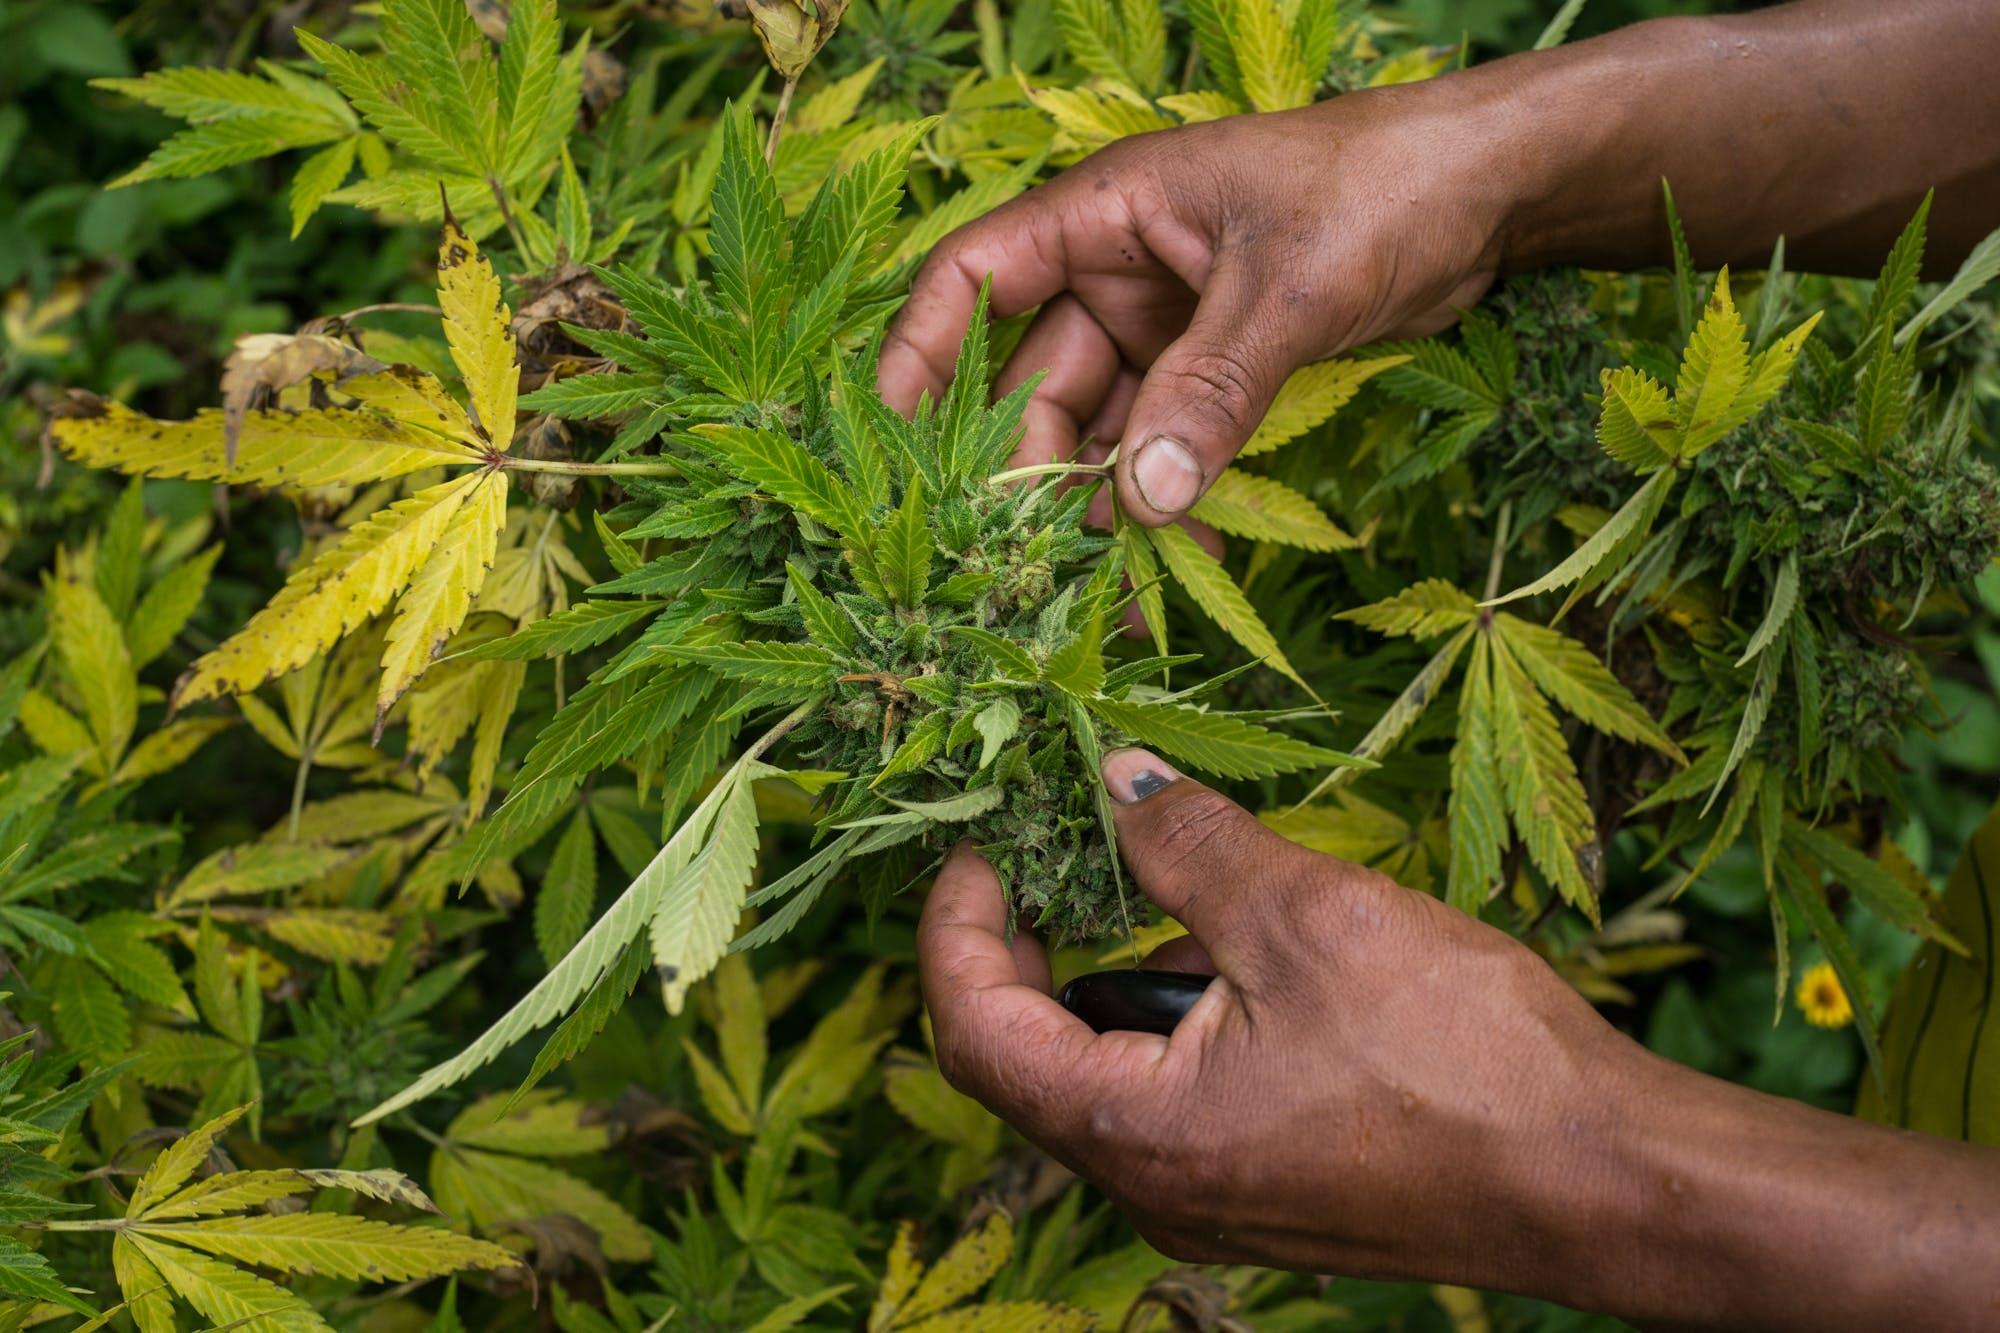 Nicolas Enriquez Marijuana   23 Its Official: Michigan is set to vote on recreational marijuana this fall